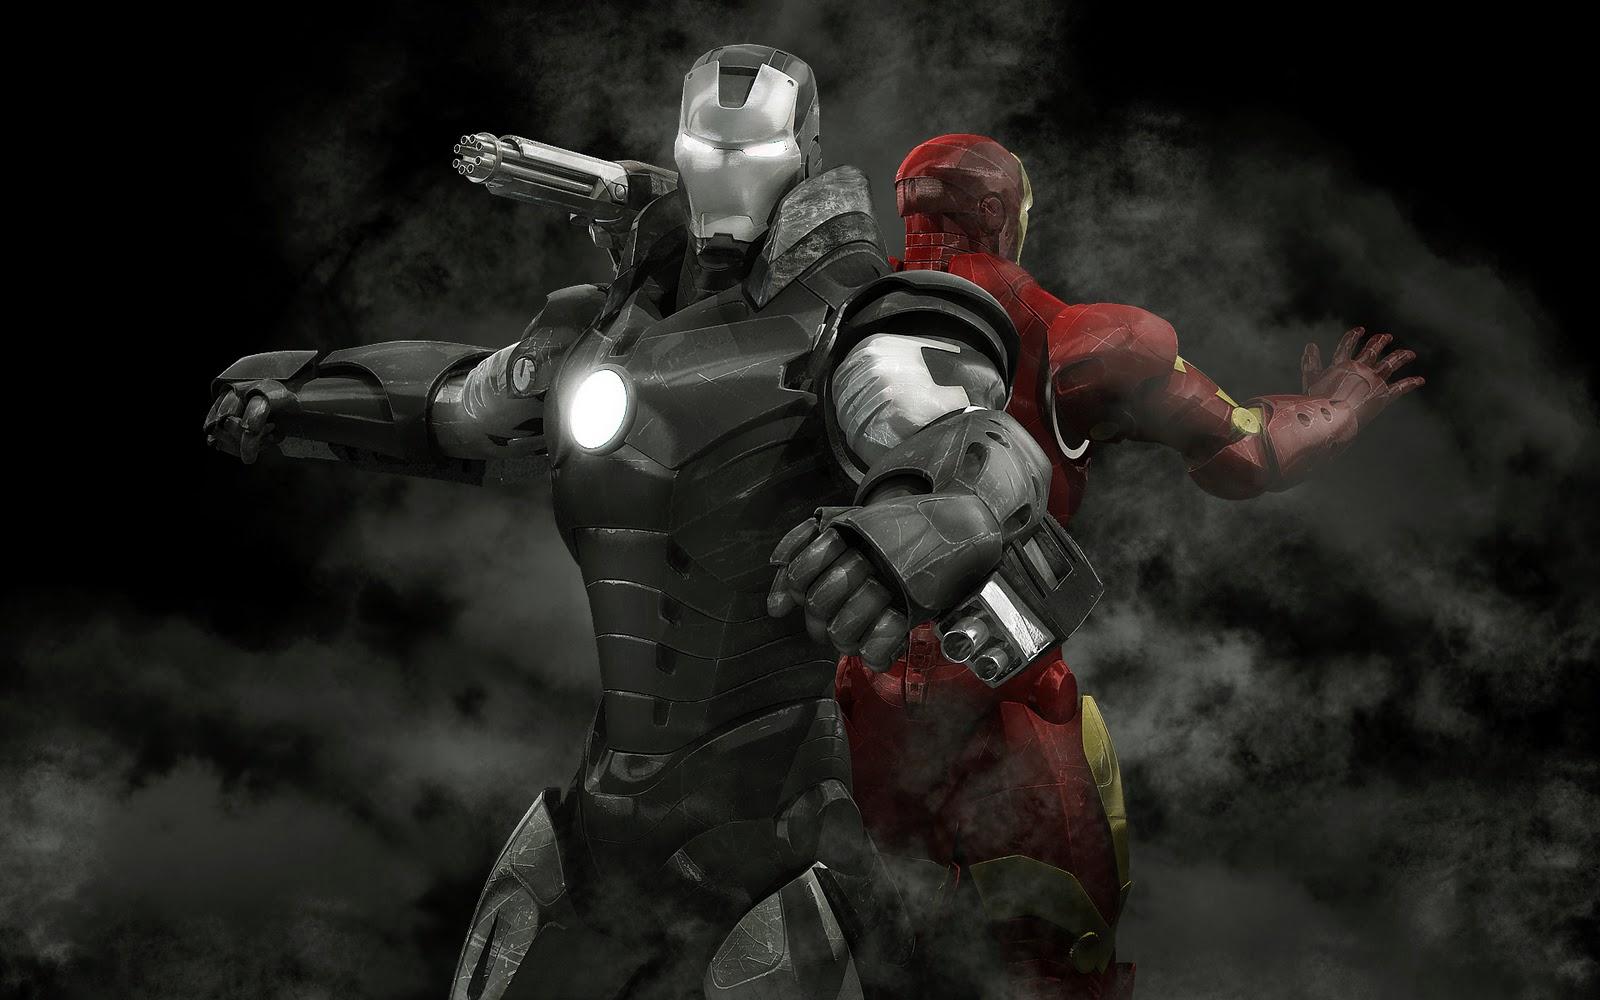 Iron Man 2: TOYS, COMICS And MORE: IRON MAN 2 Backgrounds